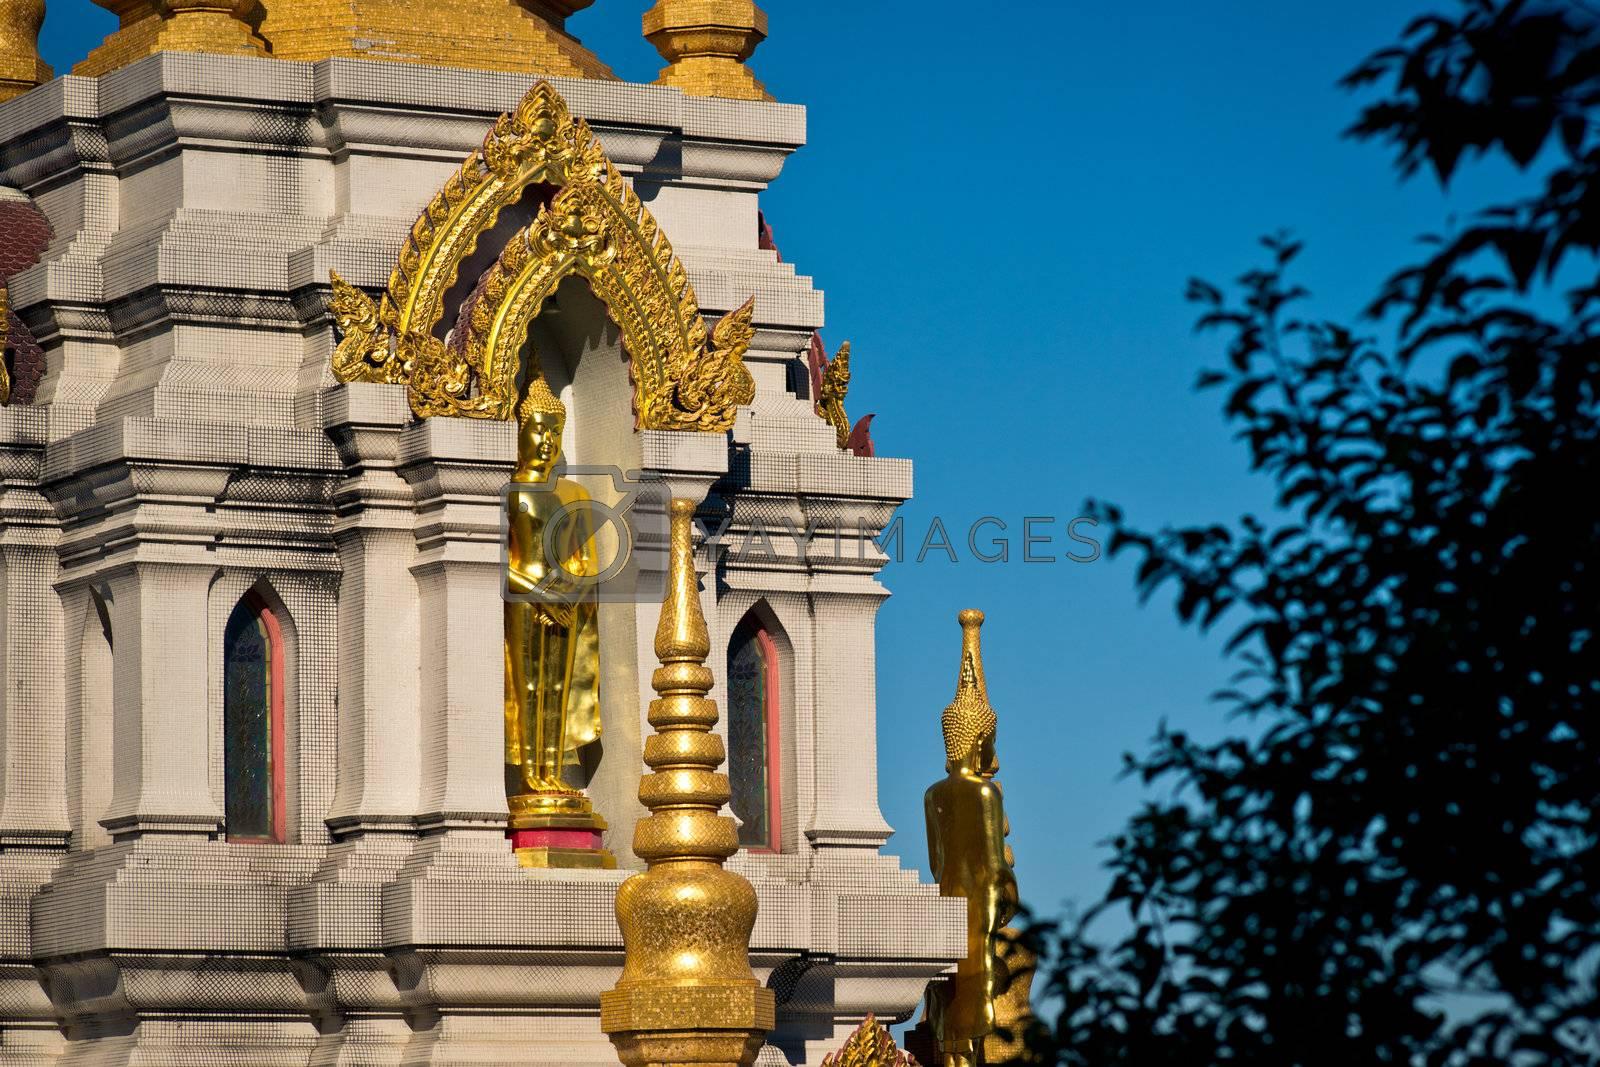 Golden statue of Buddha in buddhist chedi